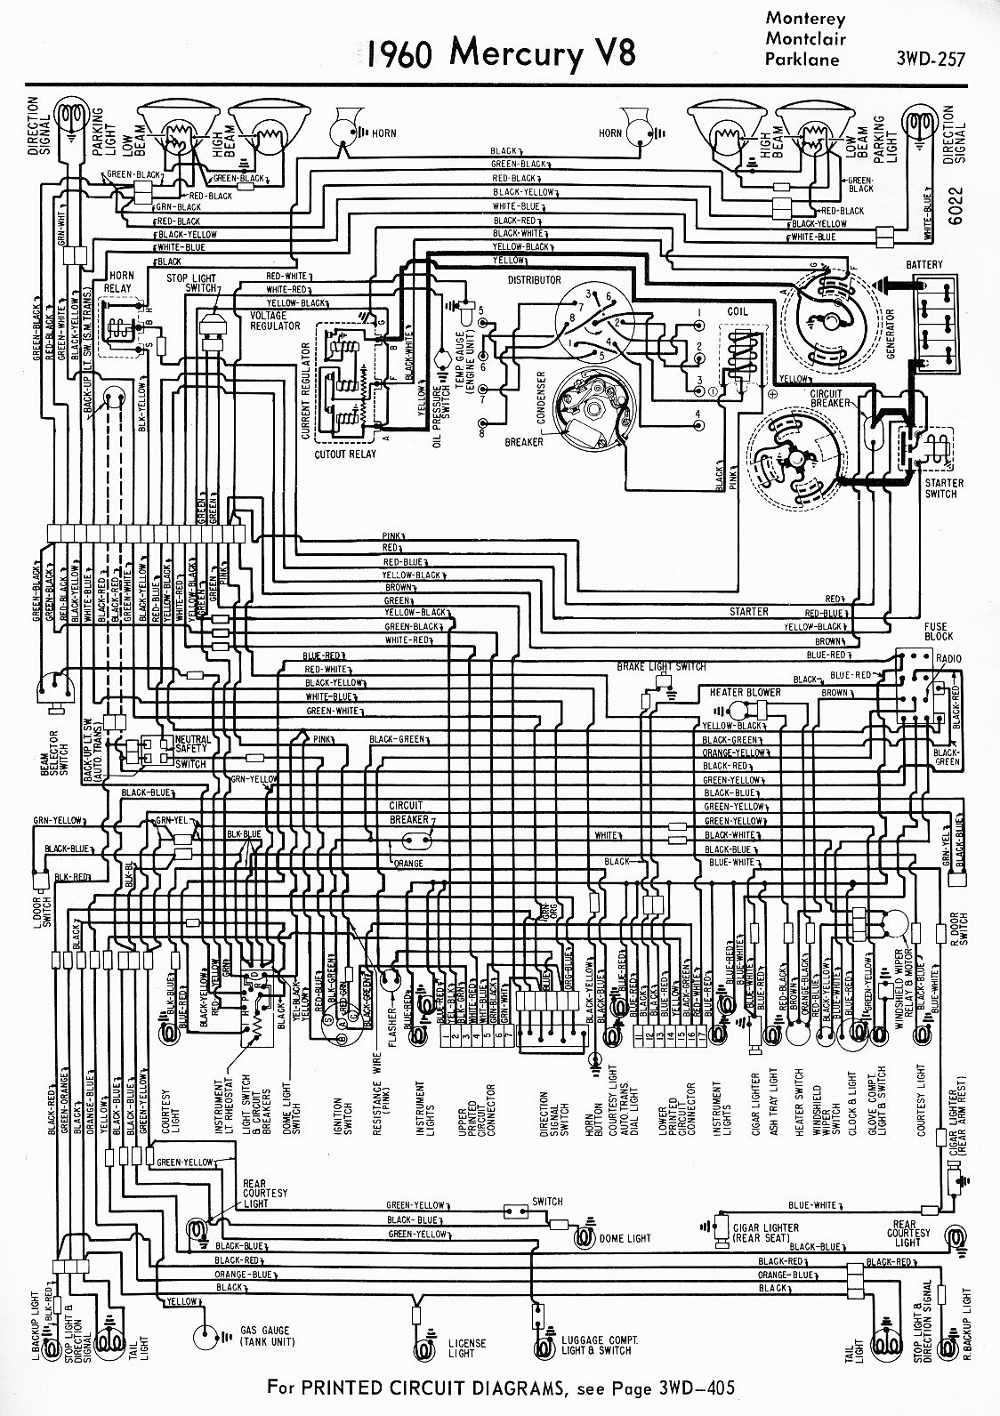 Bluebird Wiring Diagrams - Wiring Diagram Data NL on bus parts diagrams, bus body diagrams, bus steering, aircraft control system diagrams, bus sketches, bus fuses, bus suspension diagrams, bus service,